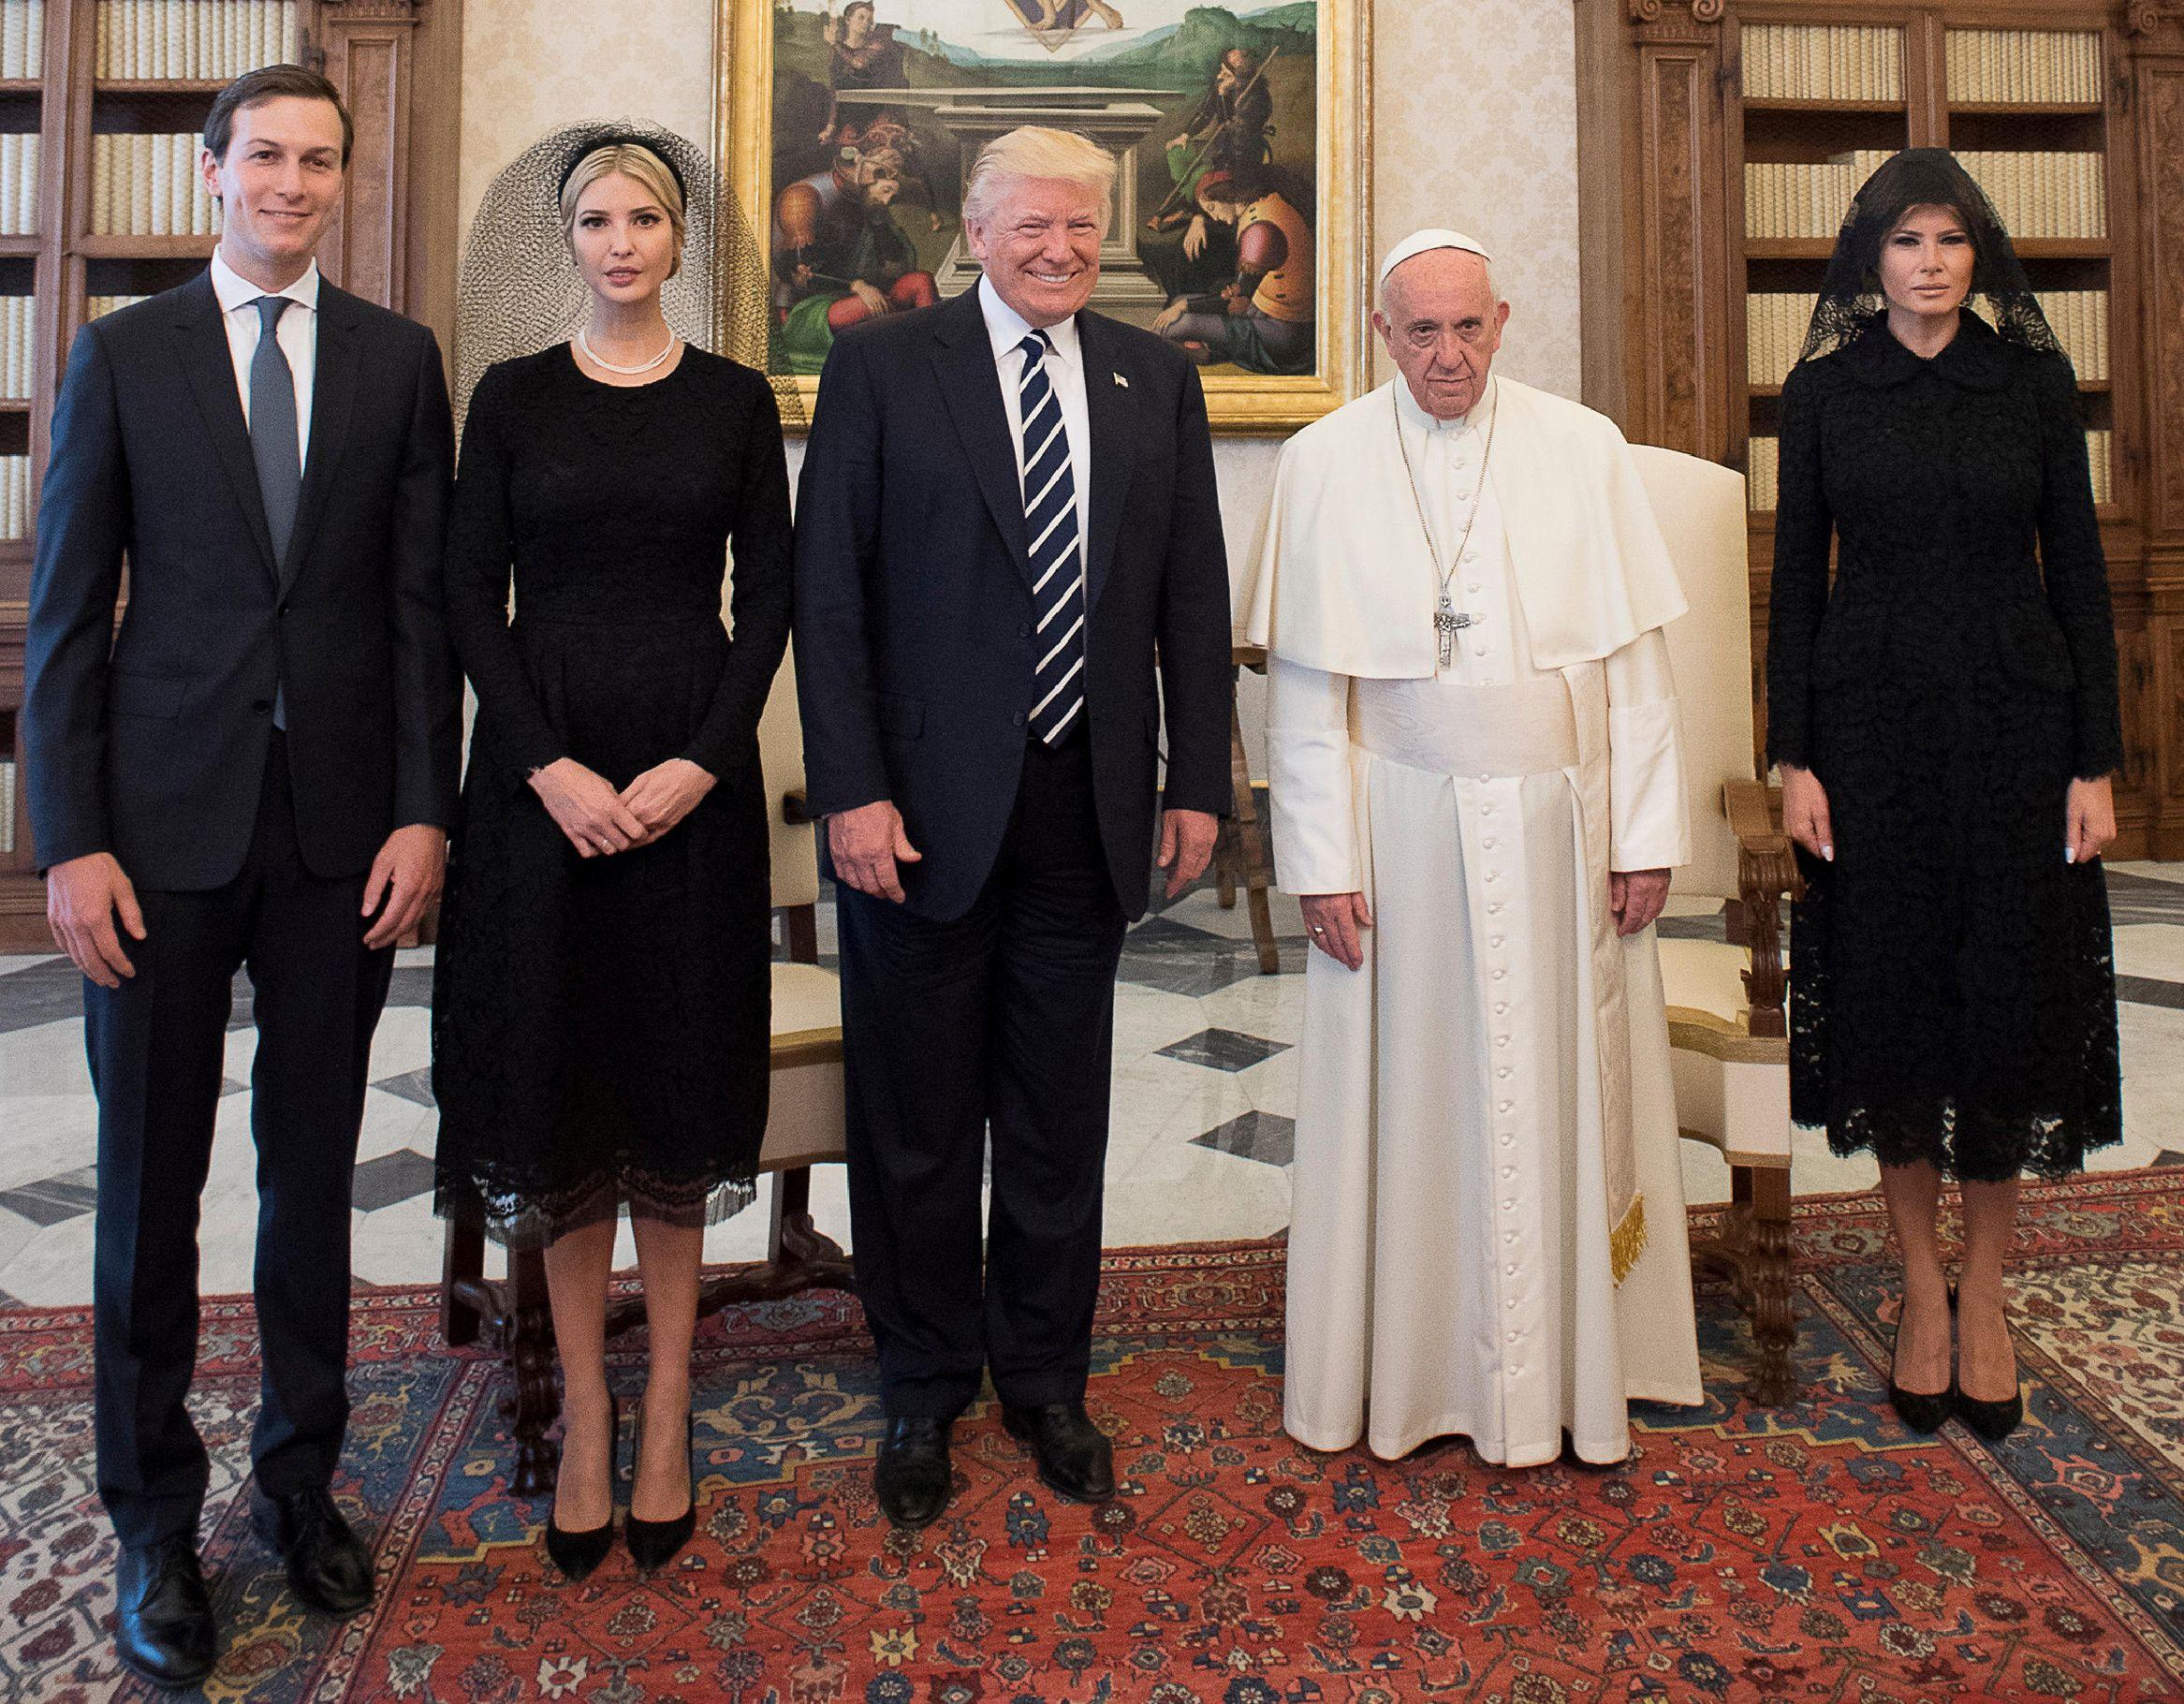 Pope Trump audience